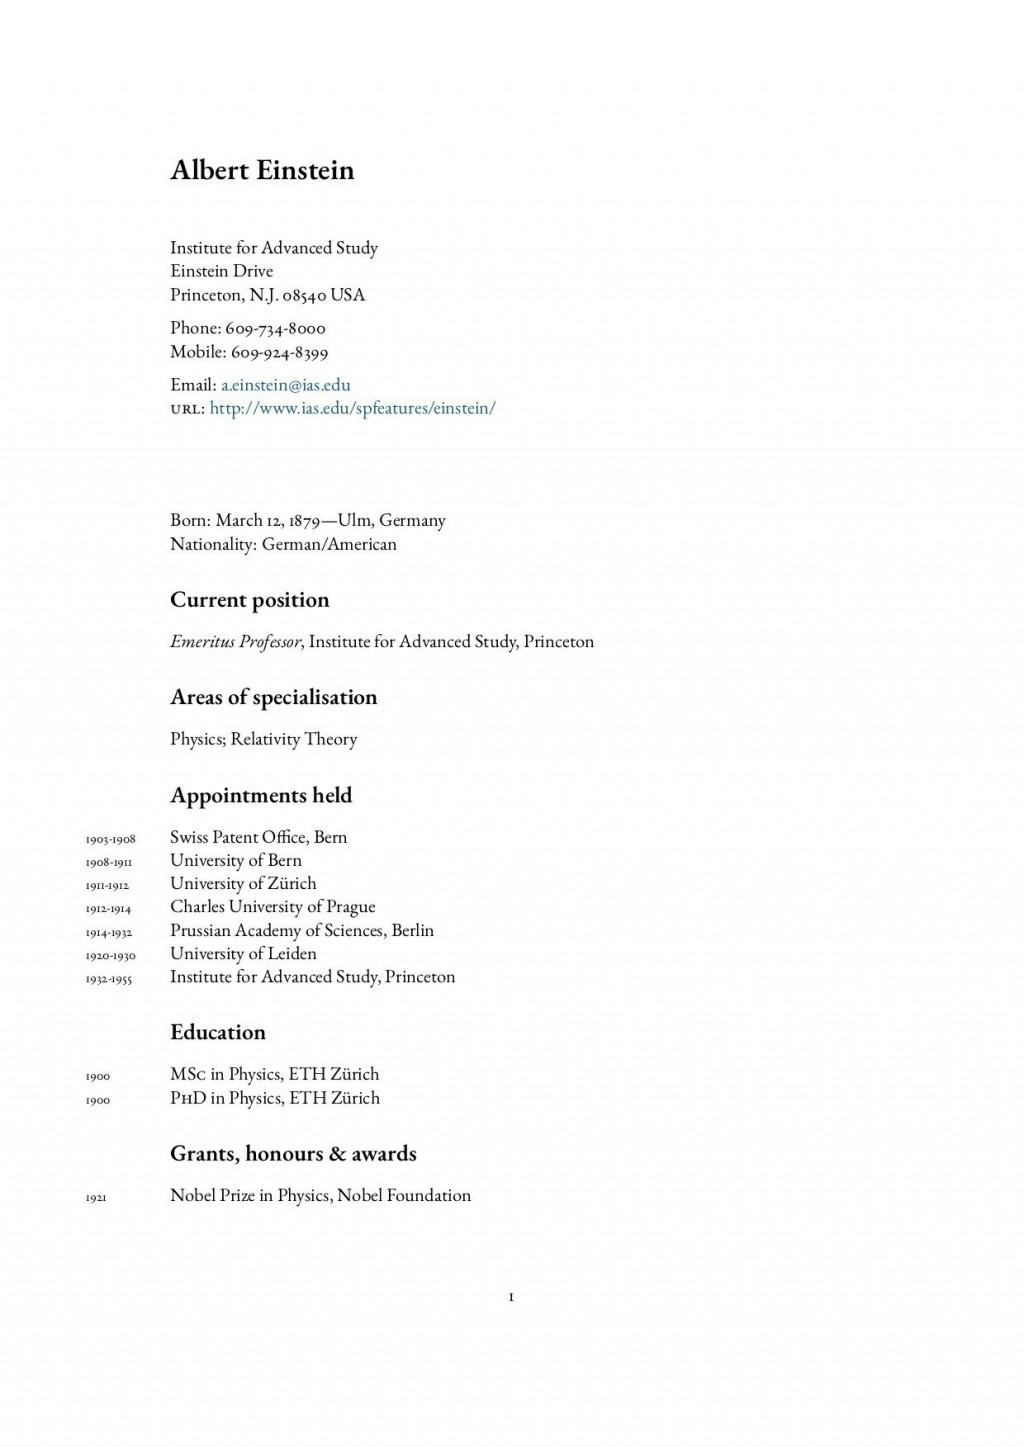 001 Imposing Graduate School Curriculum Vitae Template Picture  For Application Resume FormatLarge